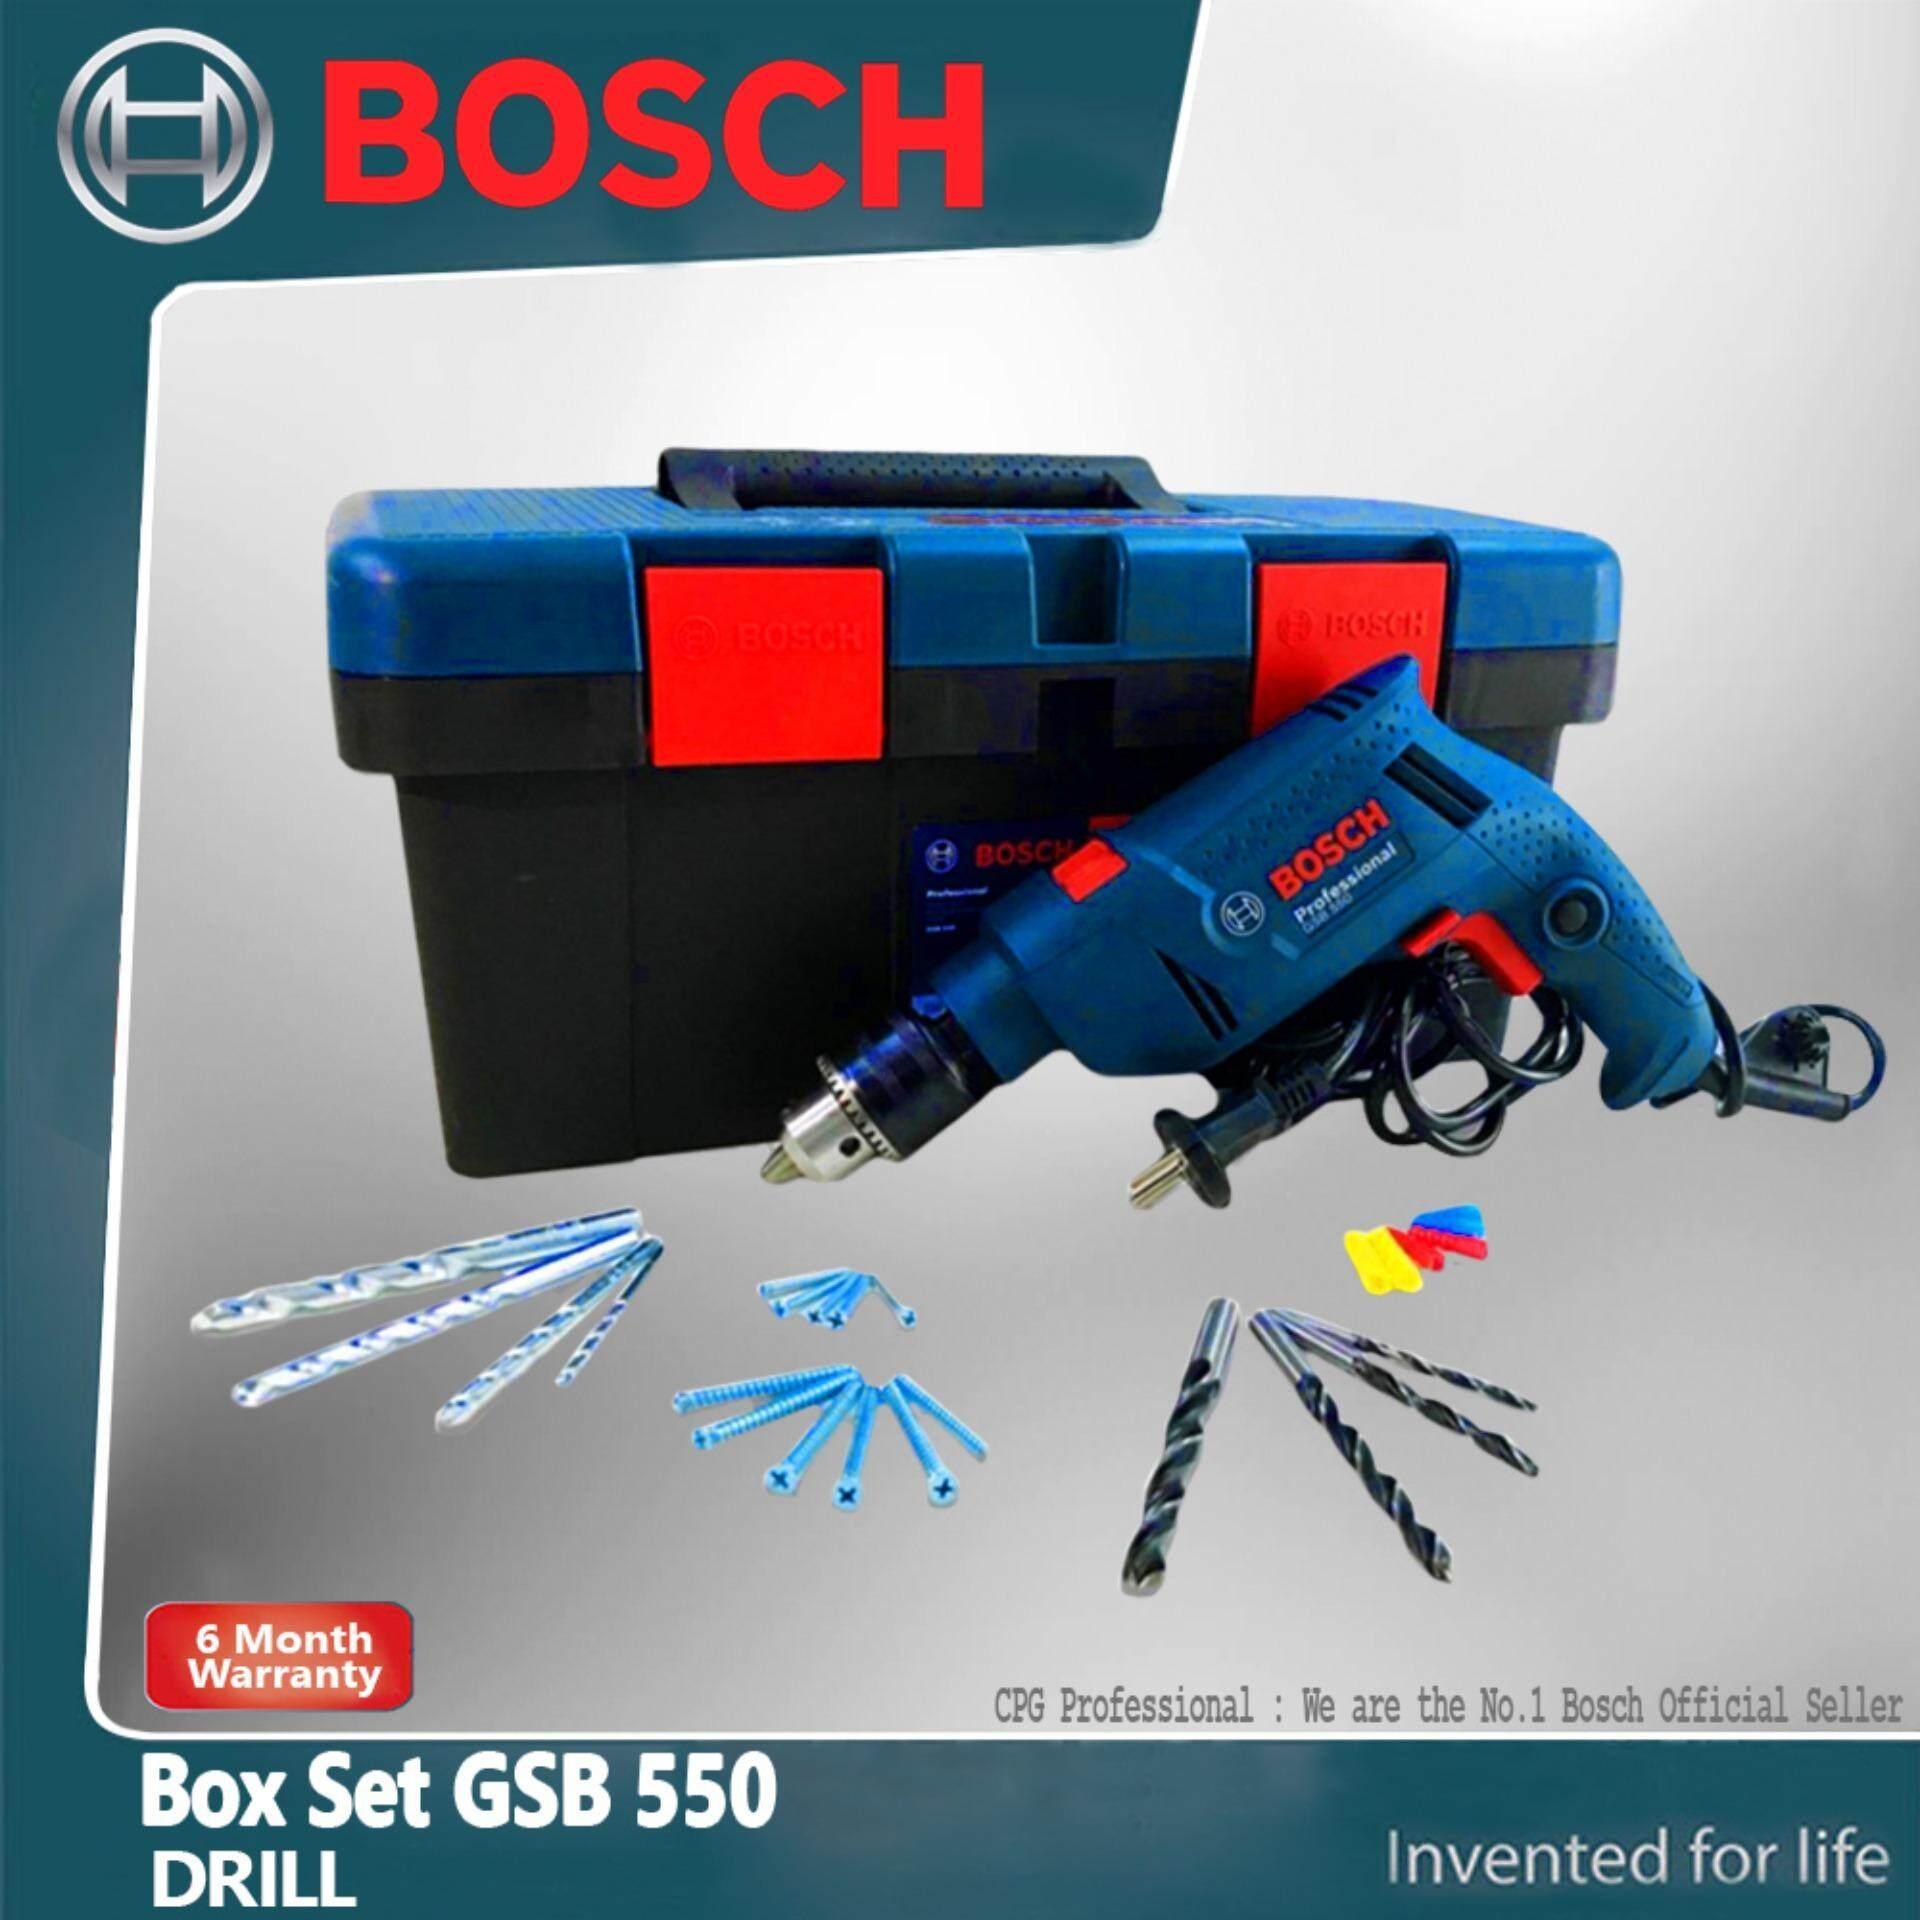 Bosch สว่านกระแทกไฟฟ้า 13มม.+ ชุดbox Set รุ่น Gsb550 พิเศษ!! คุ้มค่าสุดๆๆ ราคานี้รวม สว่าน+กล่องเครื่องมือ+ชุดดอกสว่านแท้ (ตามรูป) By Cpg Professional.